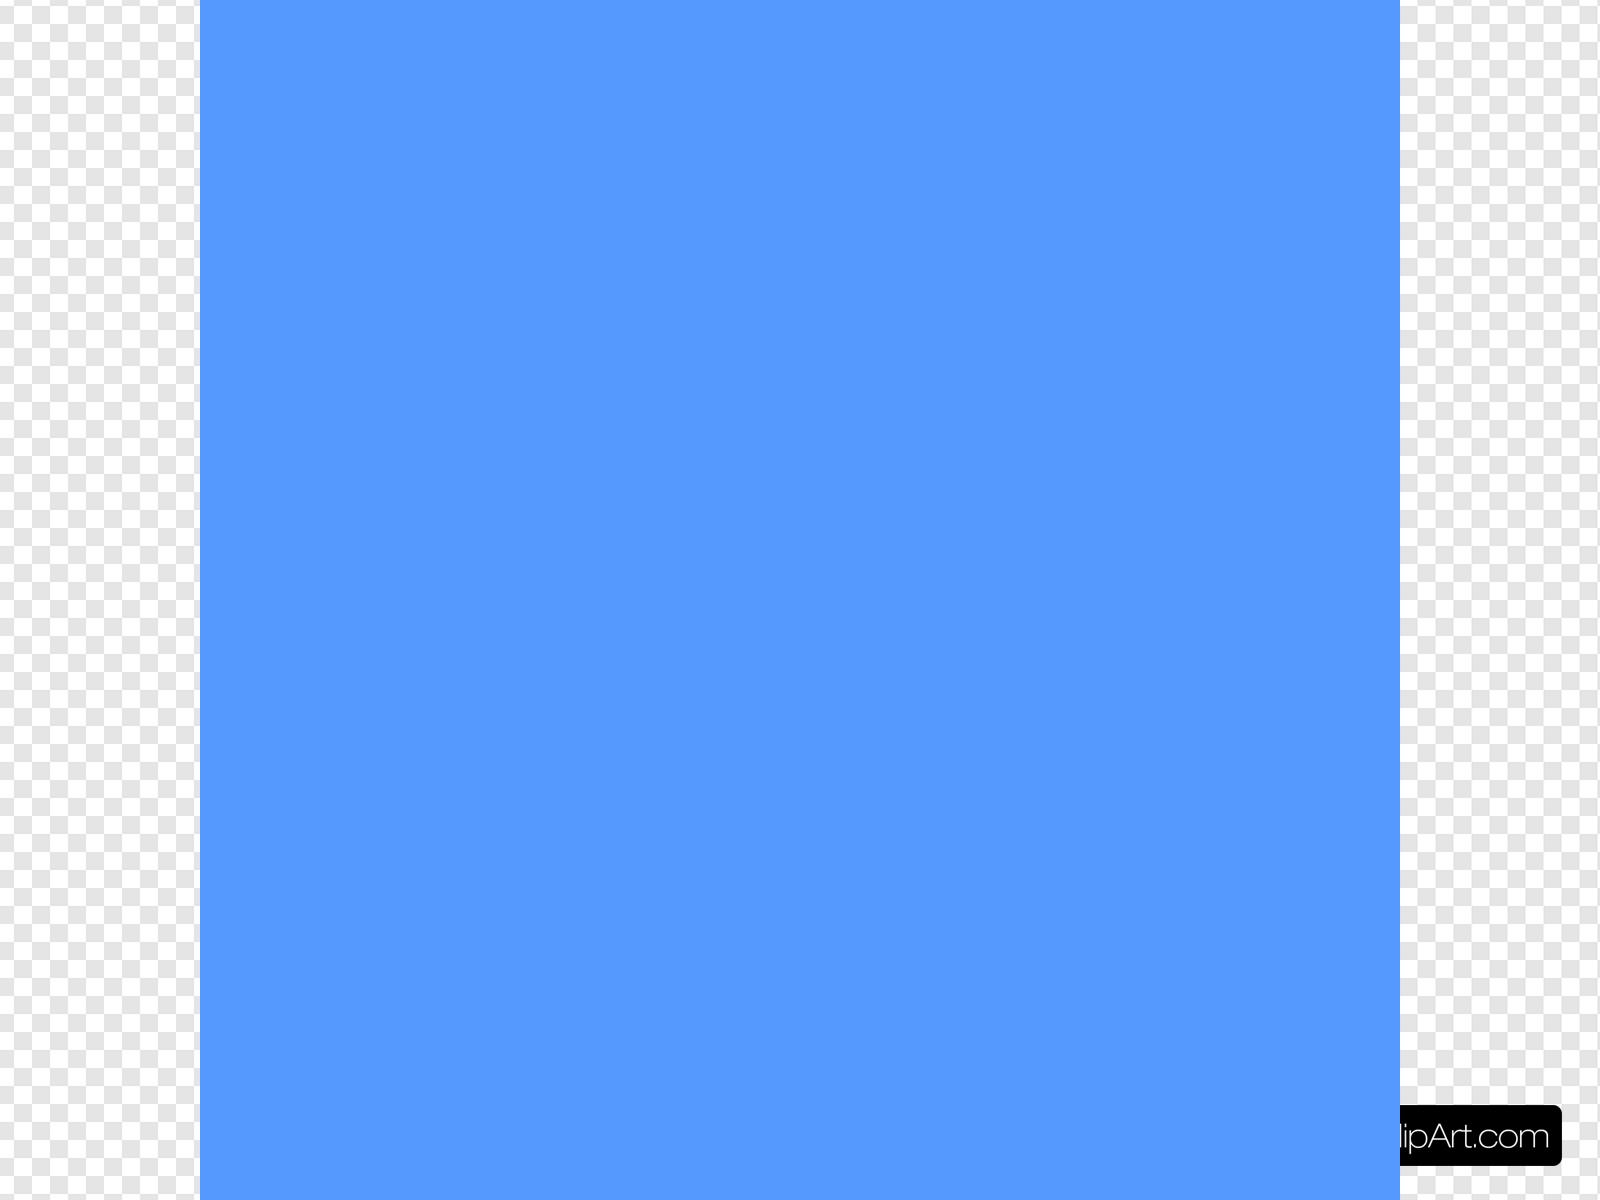 Light Blue Square Clip art, Icon and SVG.